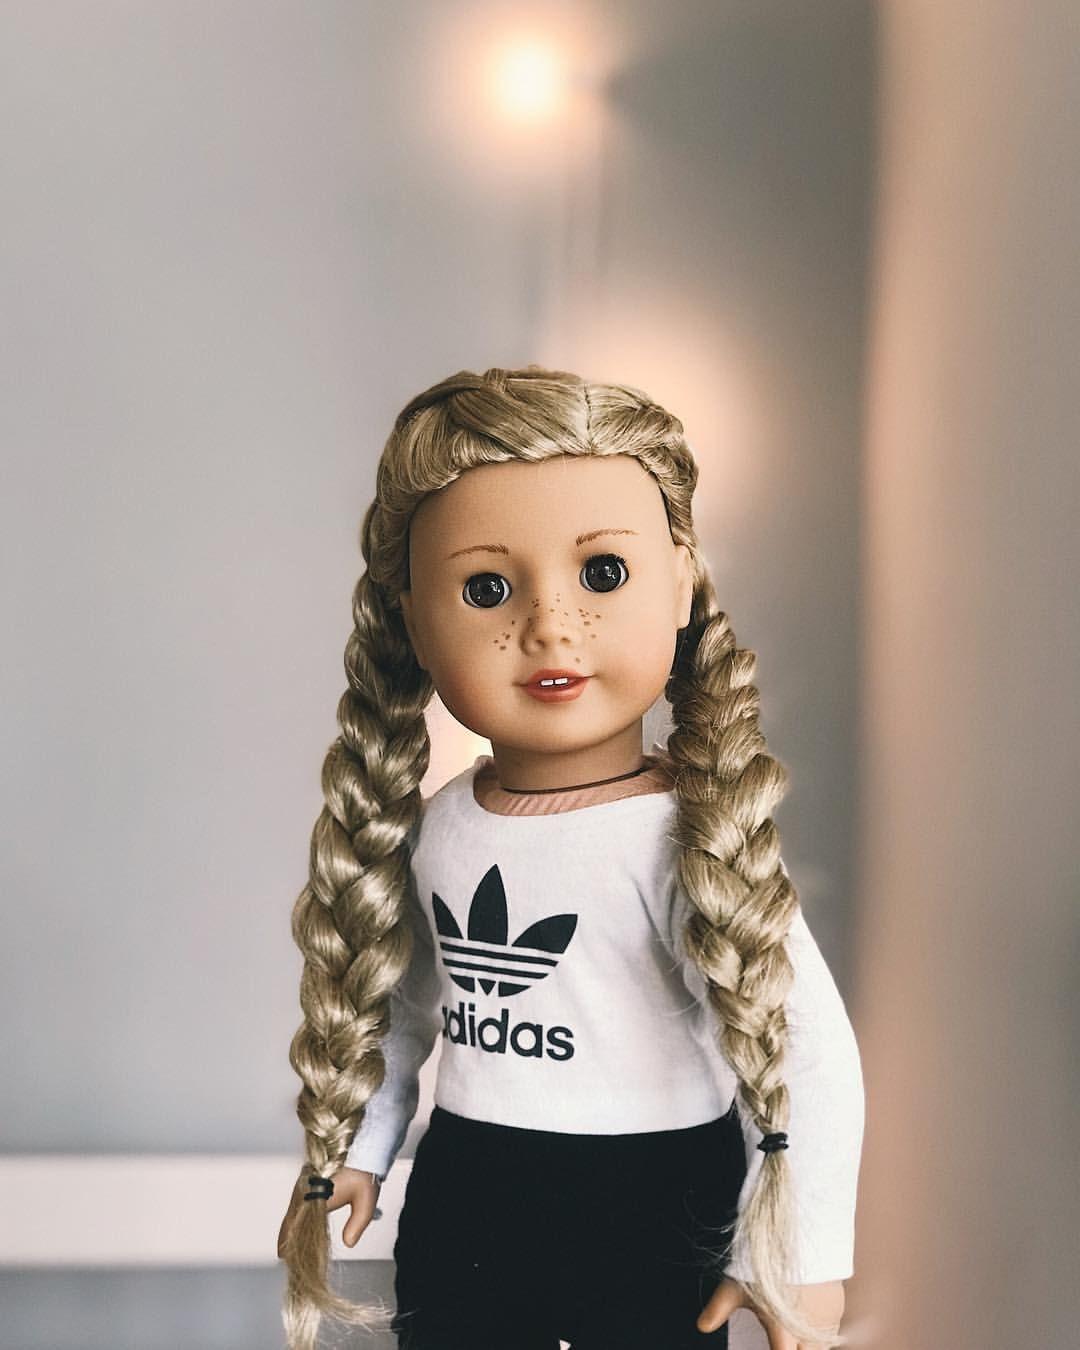 American Girl Doll Hairstyle/Braids @makenzie_ag on Instagram ...